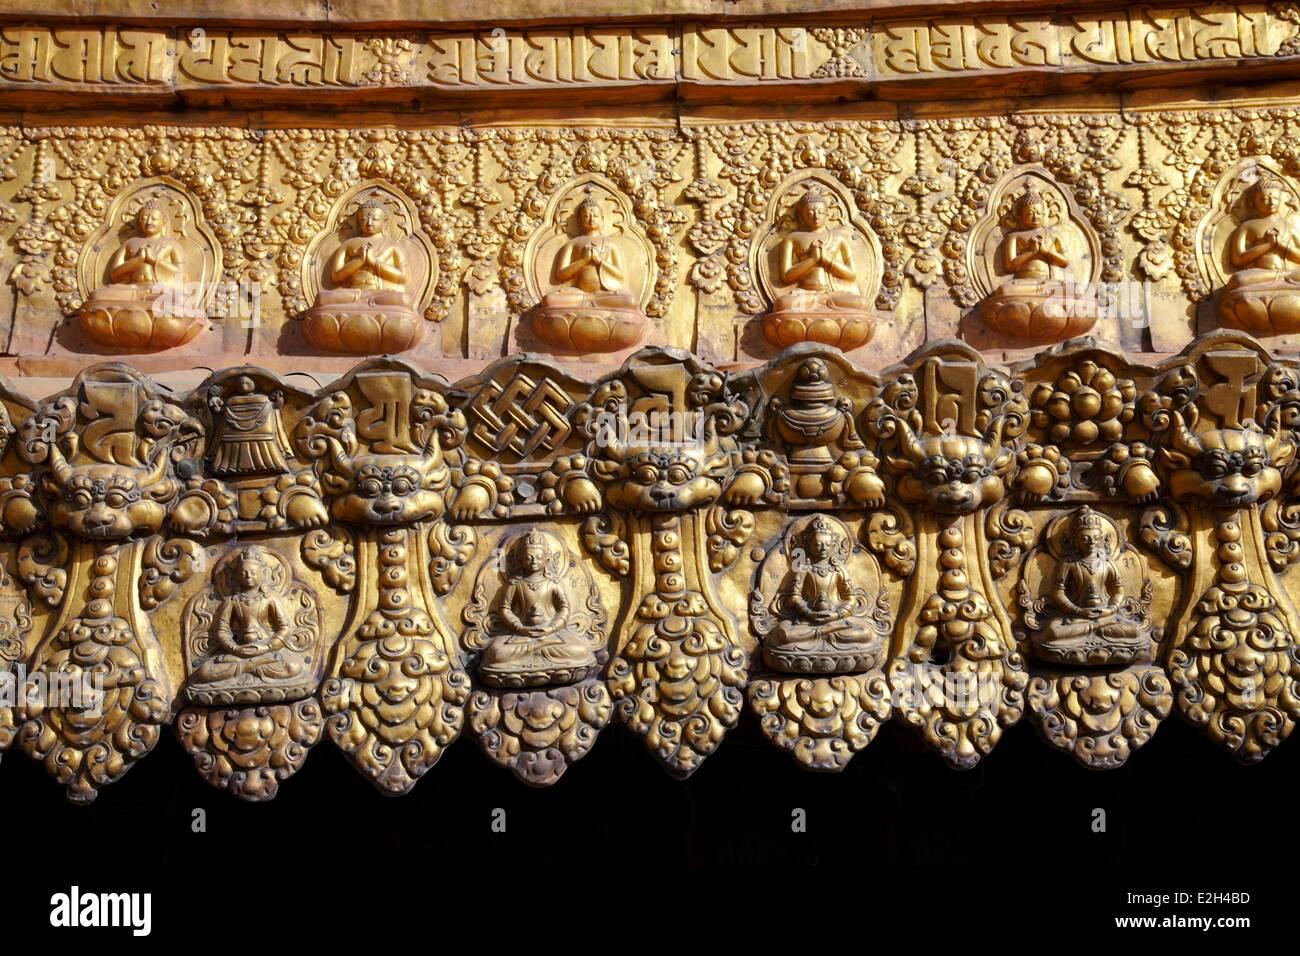 China Tibet Lhassa Buddist symbol on roof of Jokhang monastery this monastery is first Buddhist monastery build - Stock Image